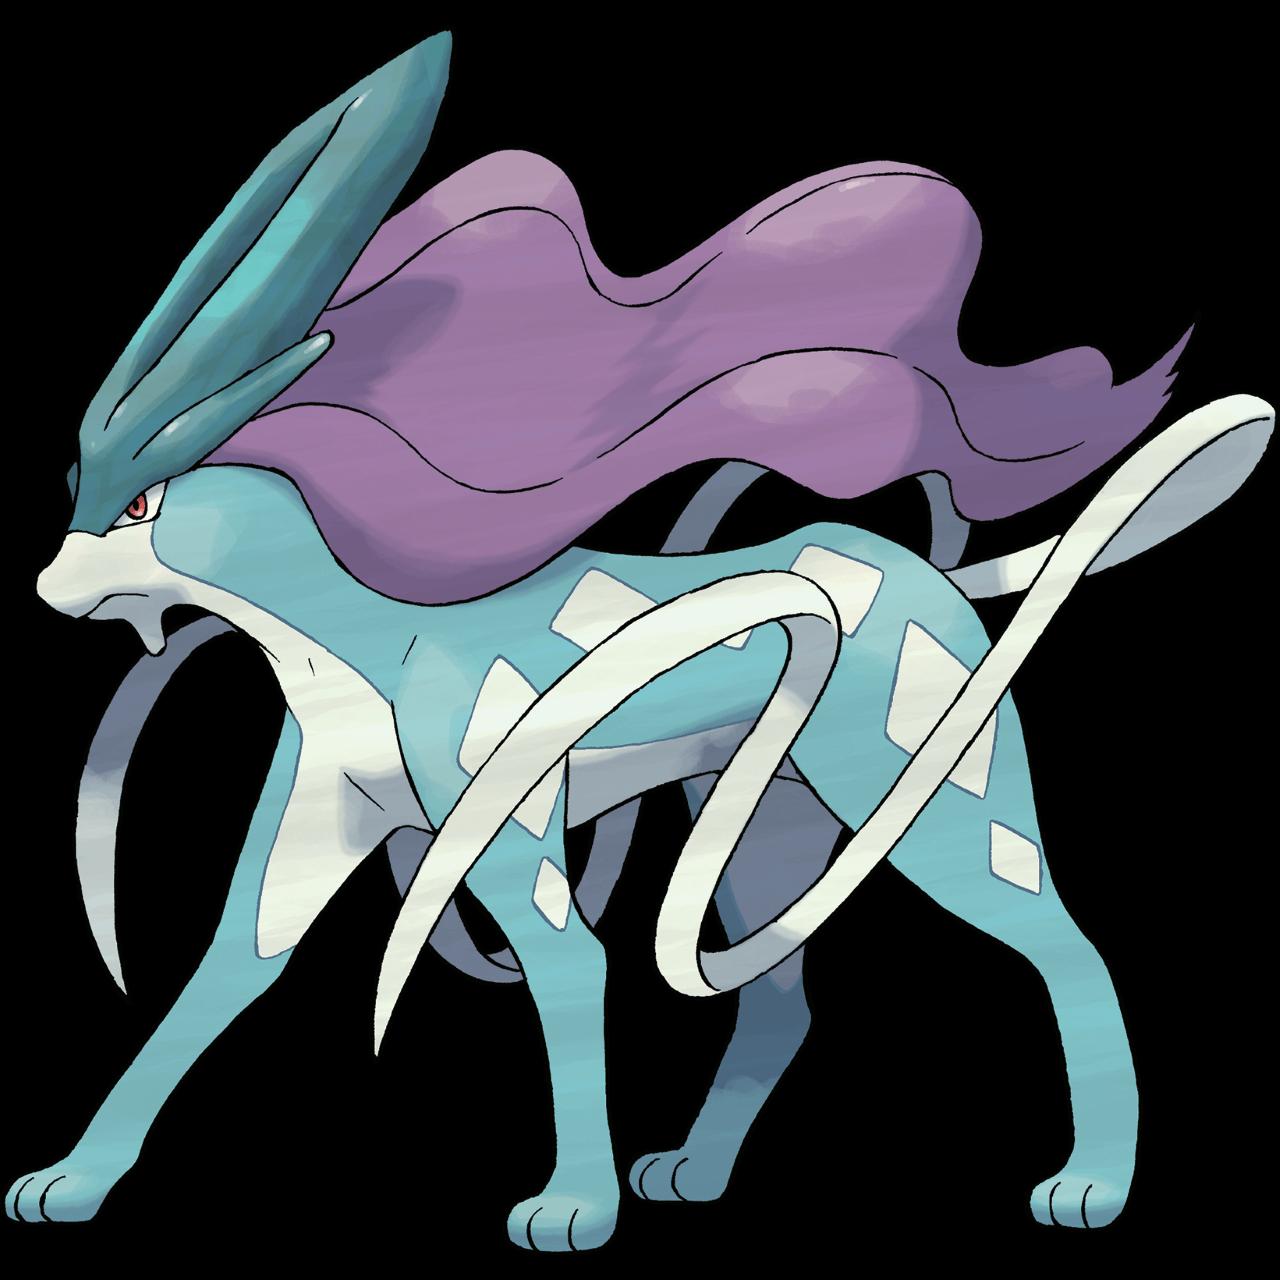 Pokémon GO: in arrivo un nuovo evento dedicato a Halloween